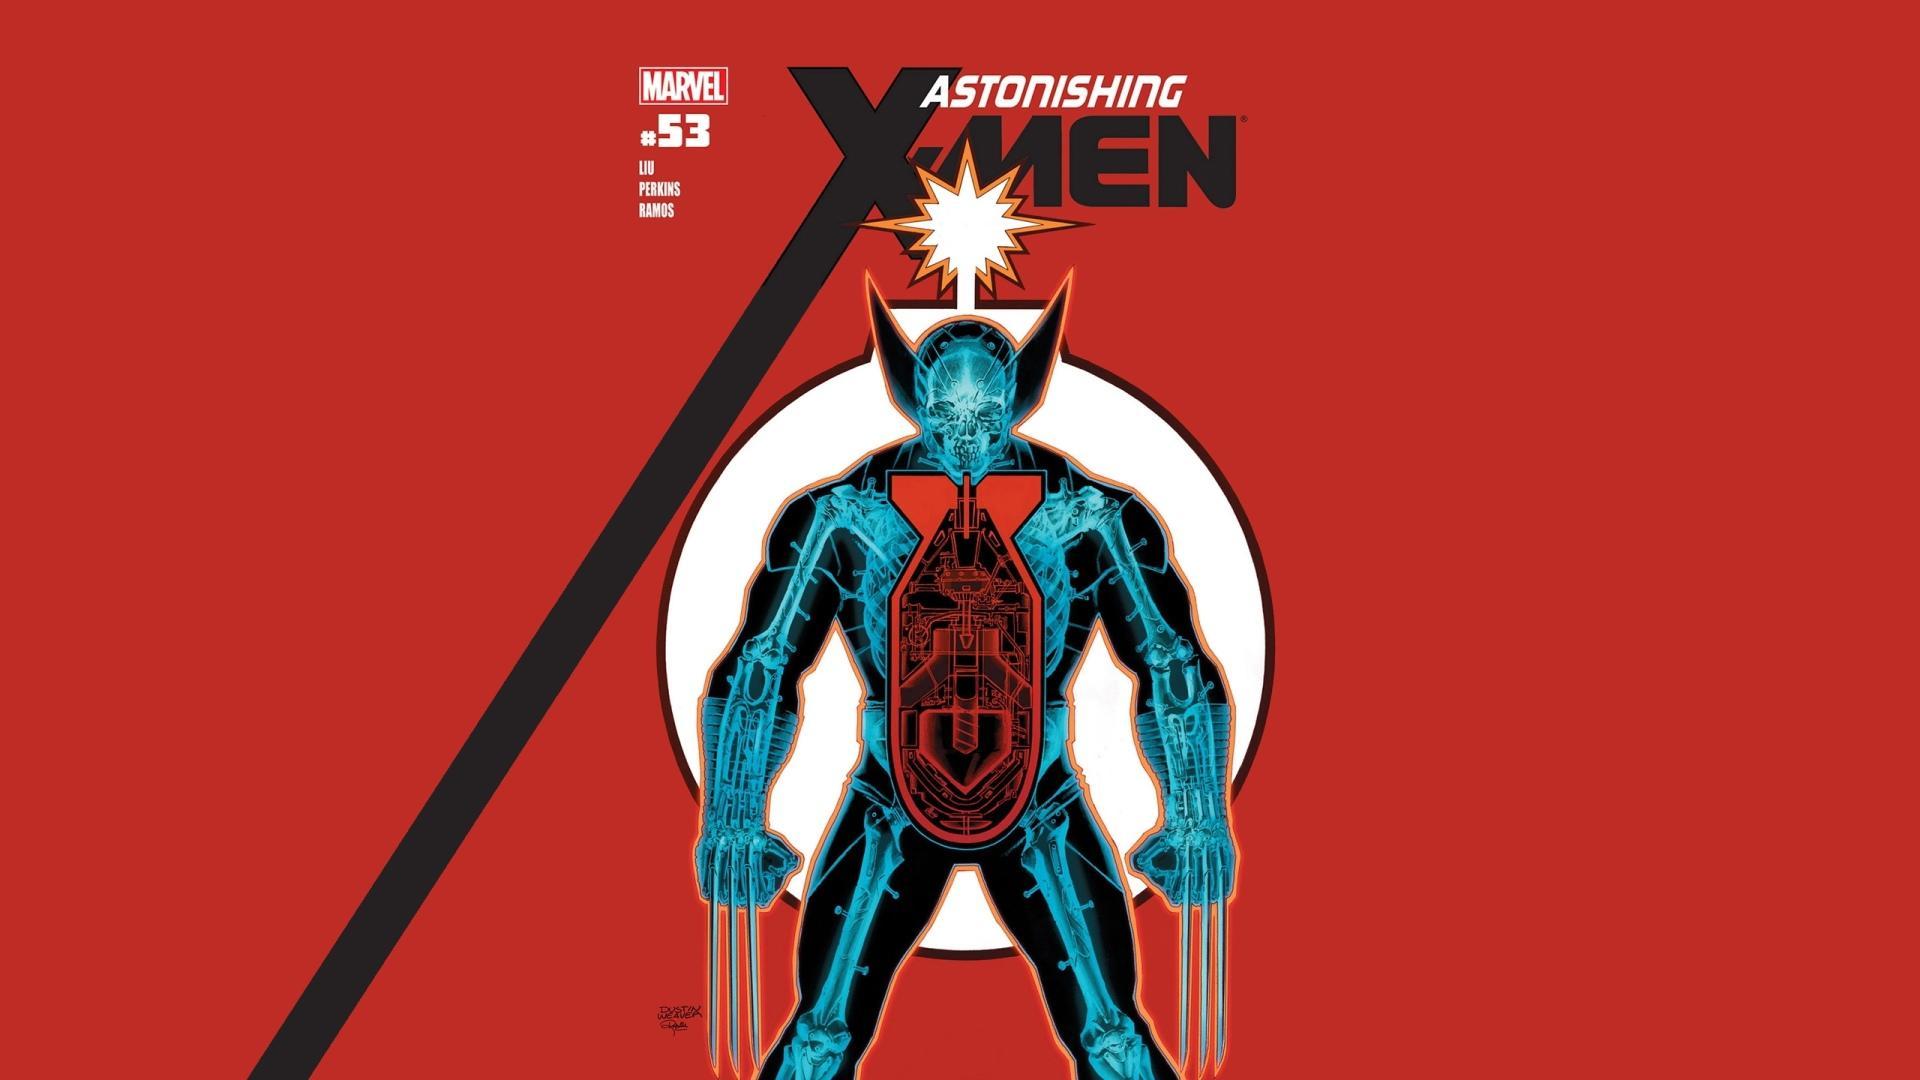 Astonishing X-Men wallpapers HD quality